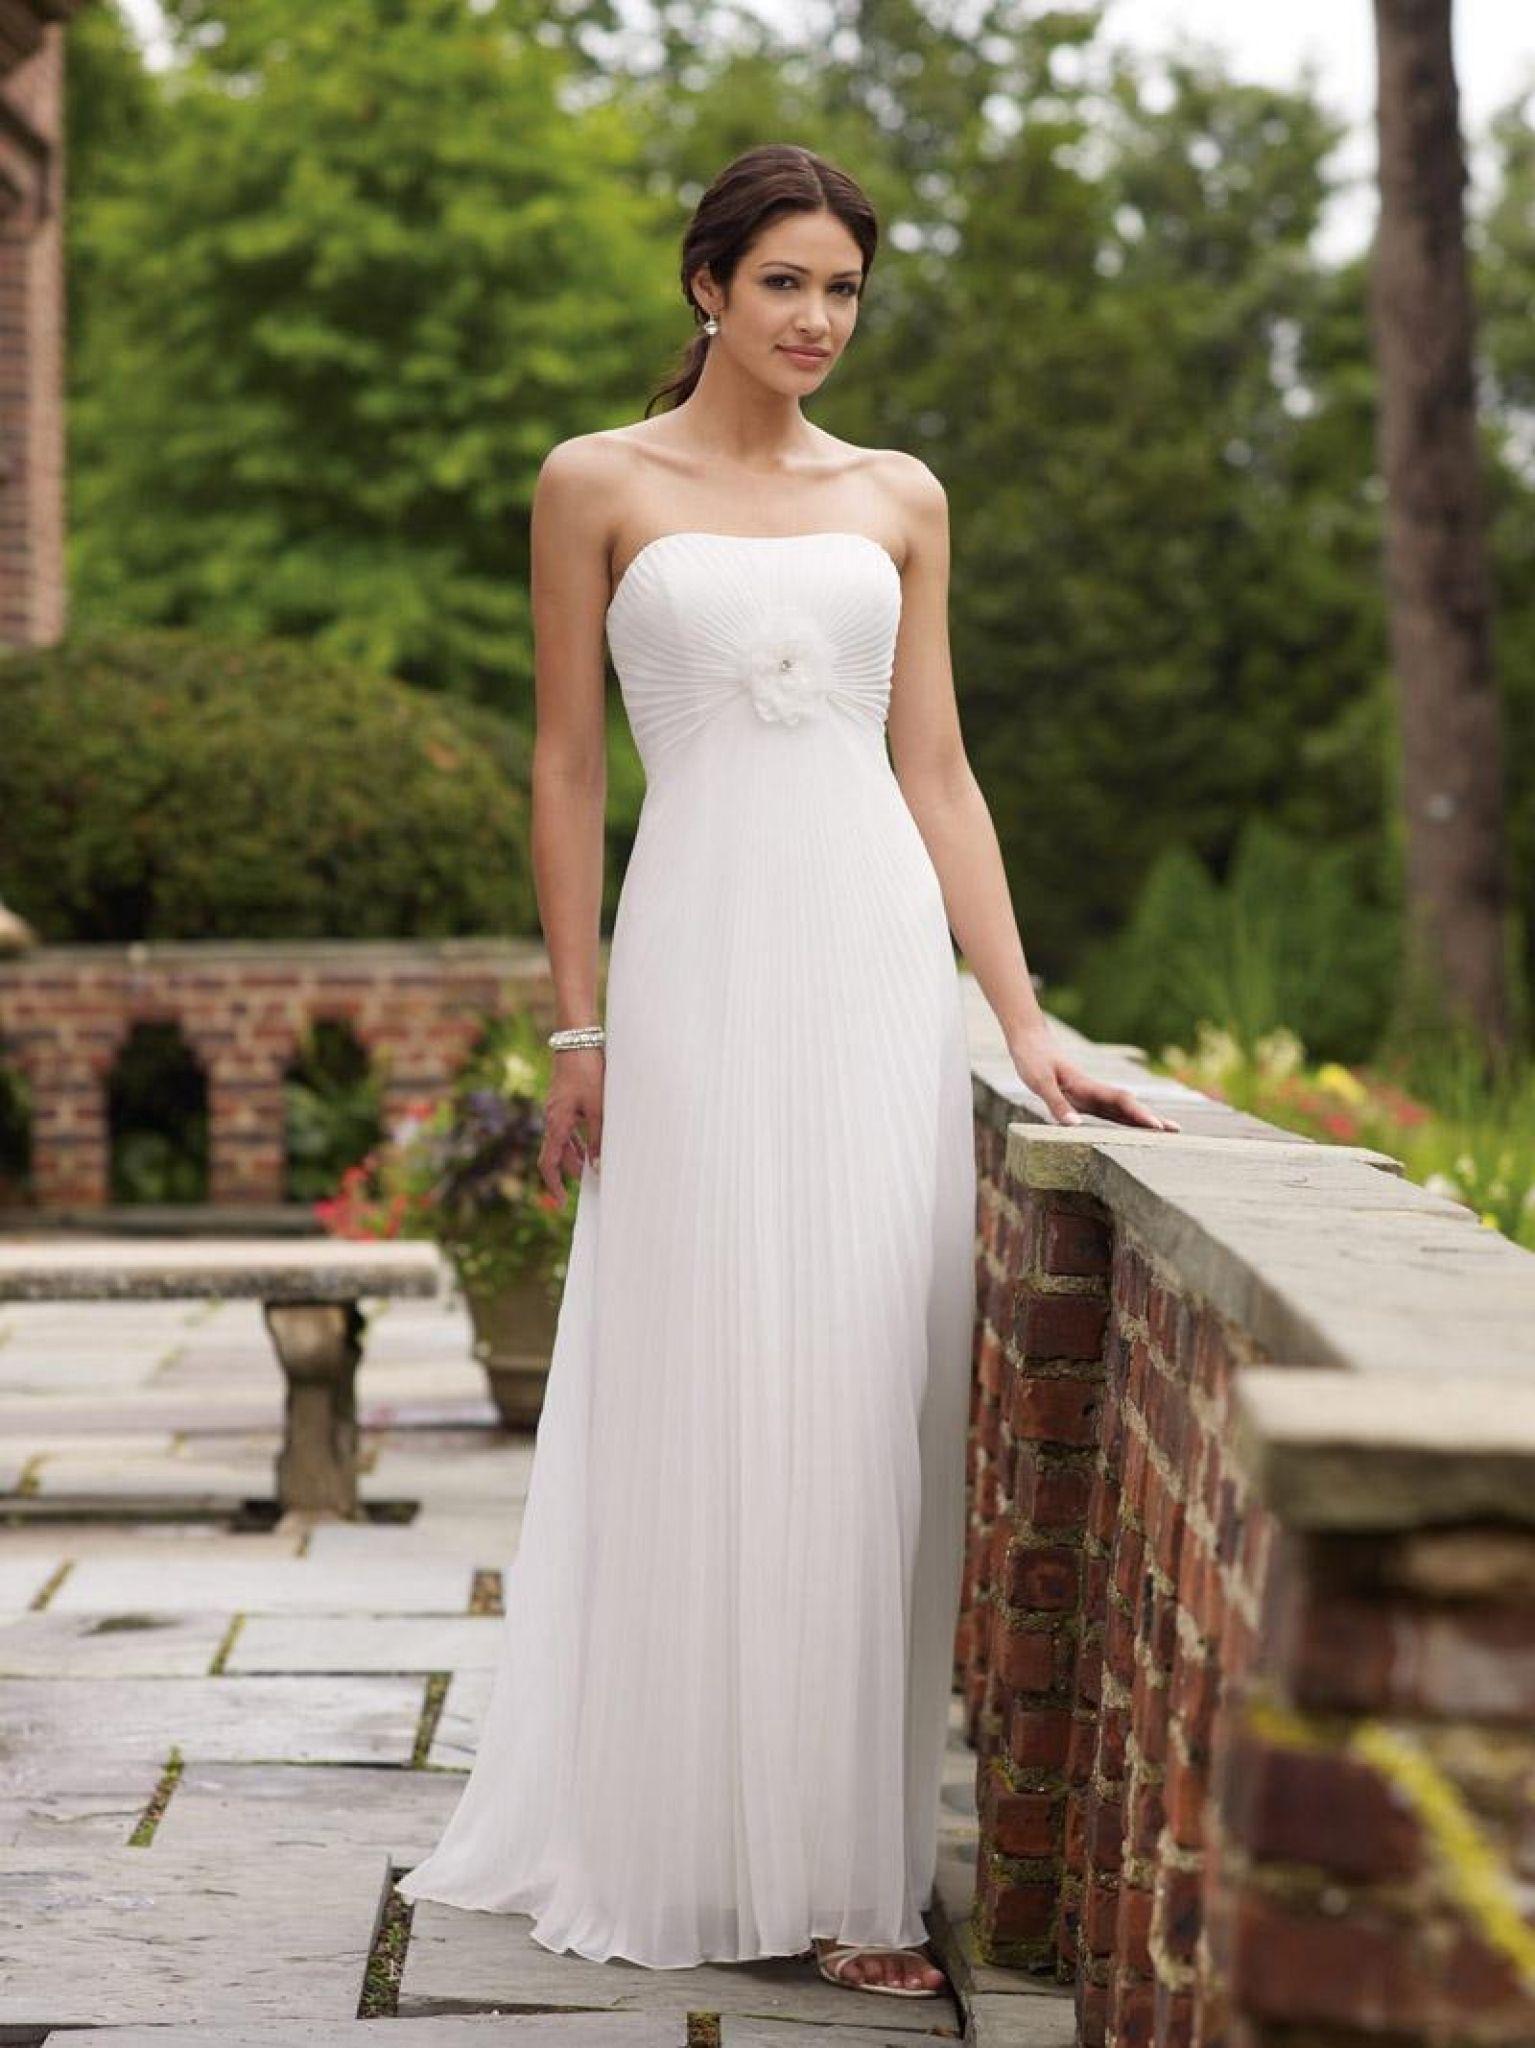 simple beautiful wedding dresses - wedding dresses for plus size ...